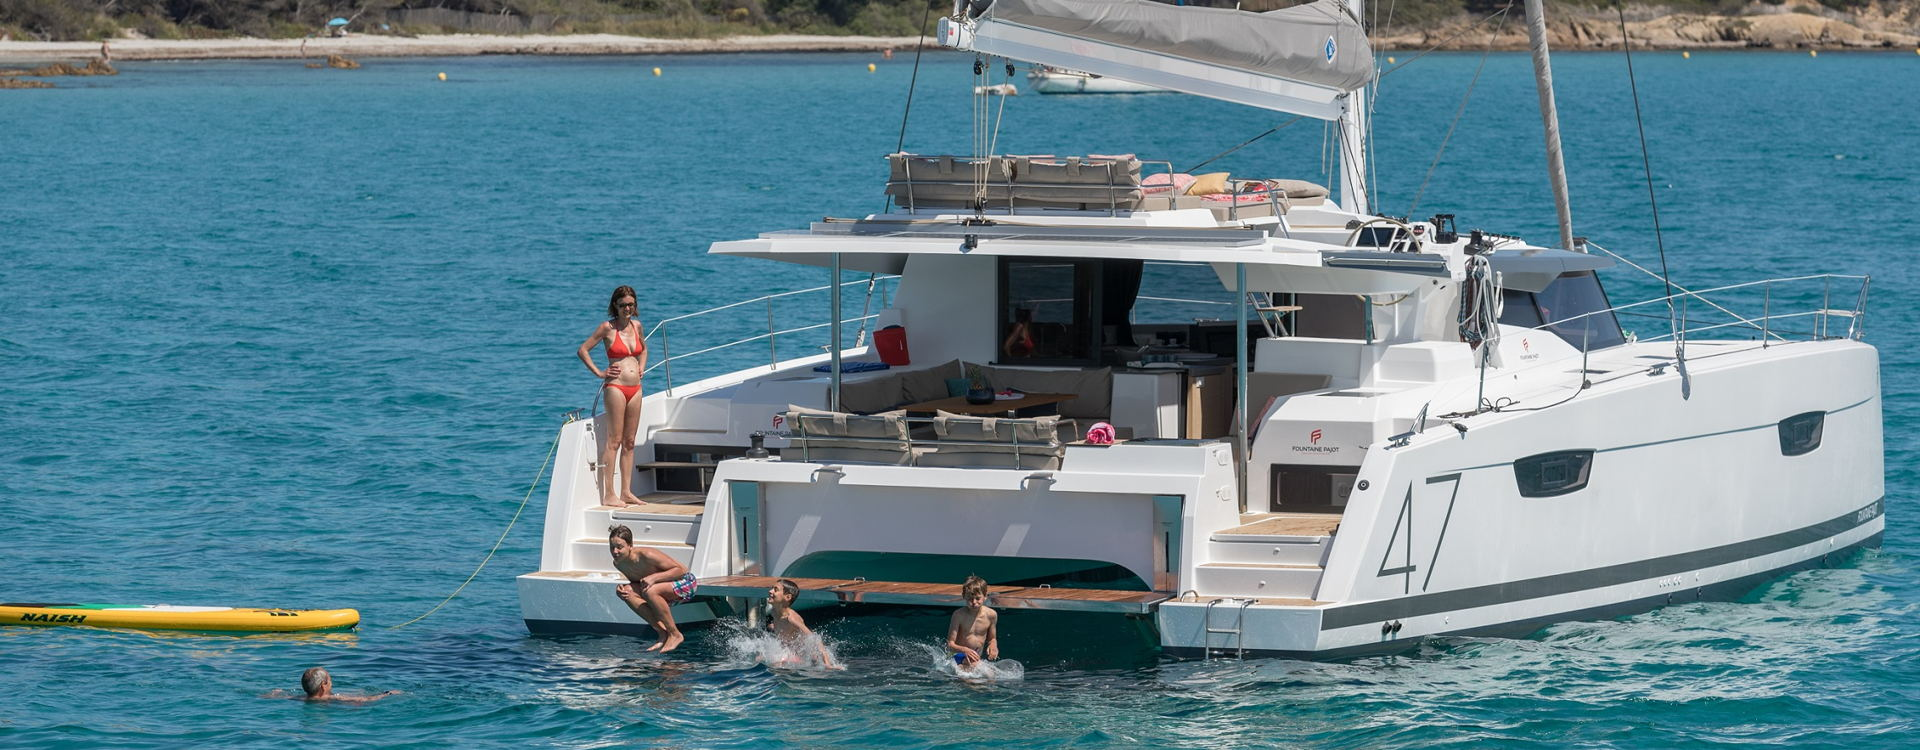 Nudist Cruise Announced for Carnival Ship   TravelPulse